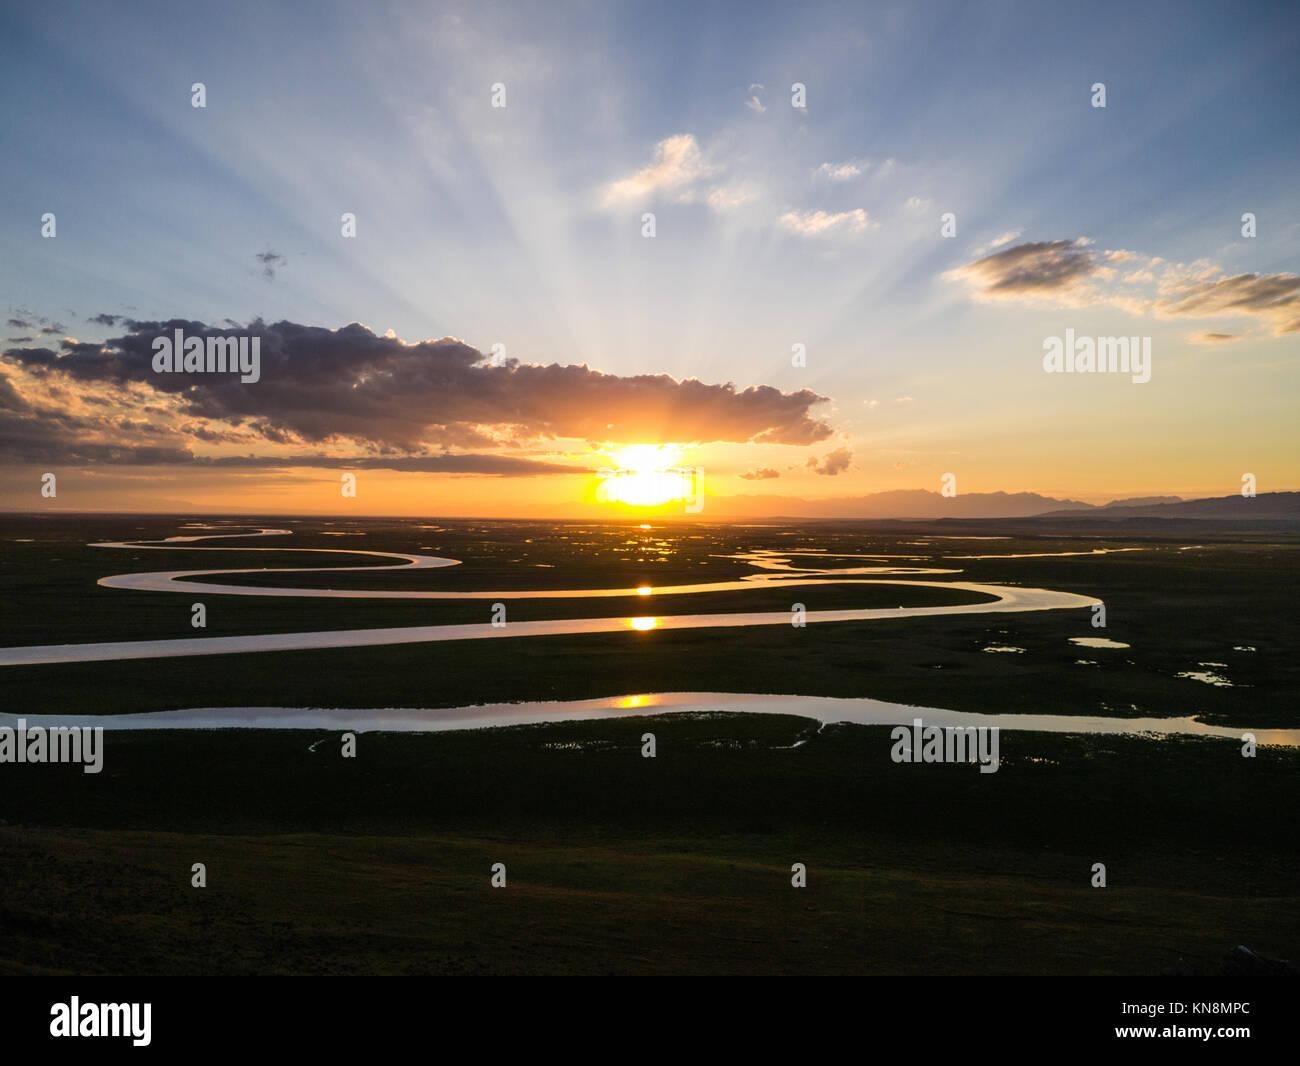 ebook Simulation of Ecological